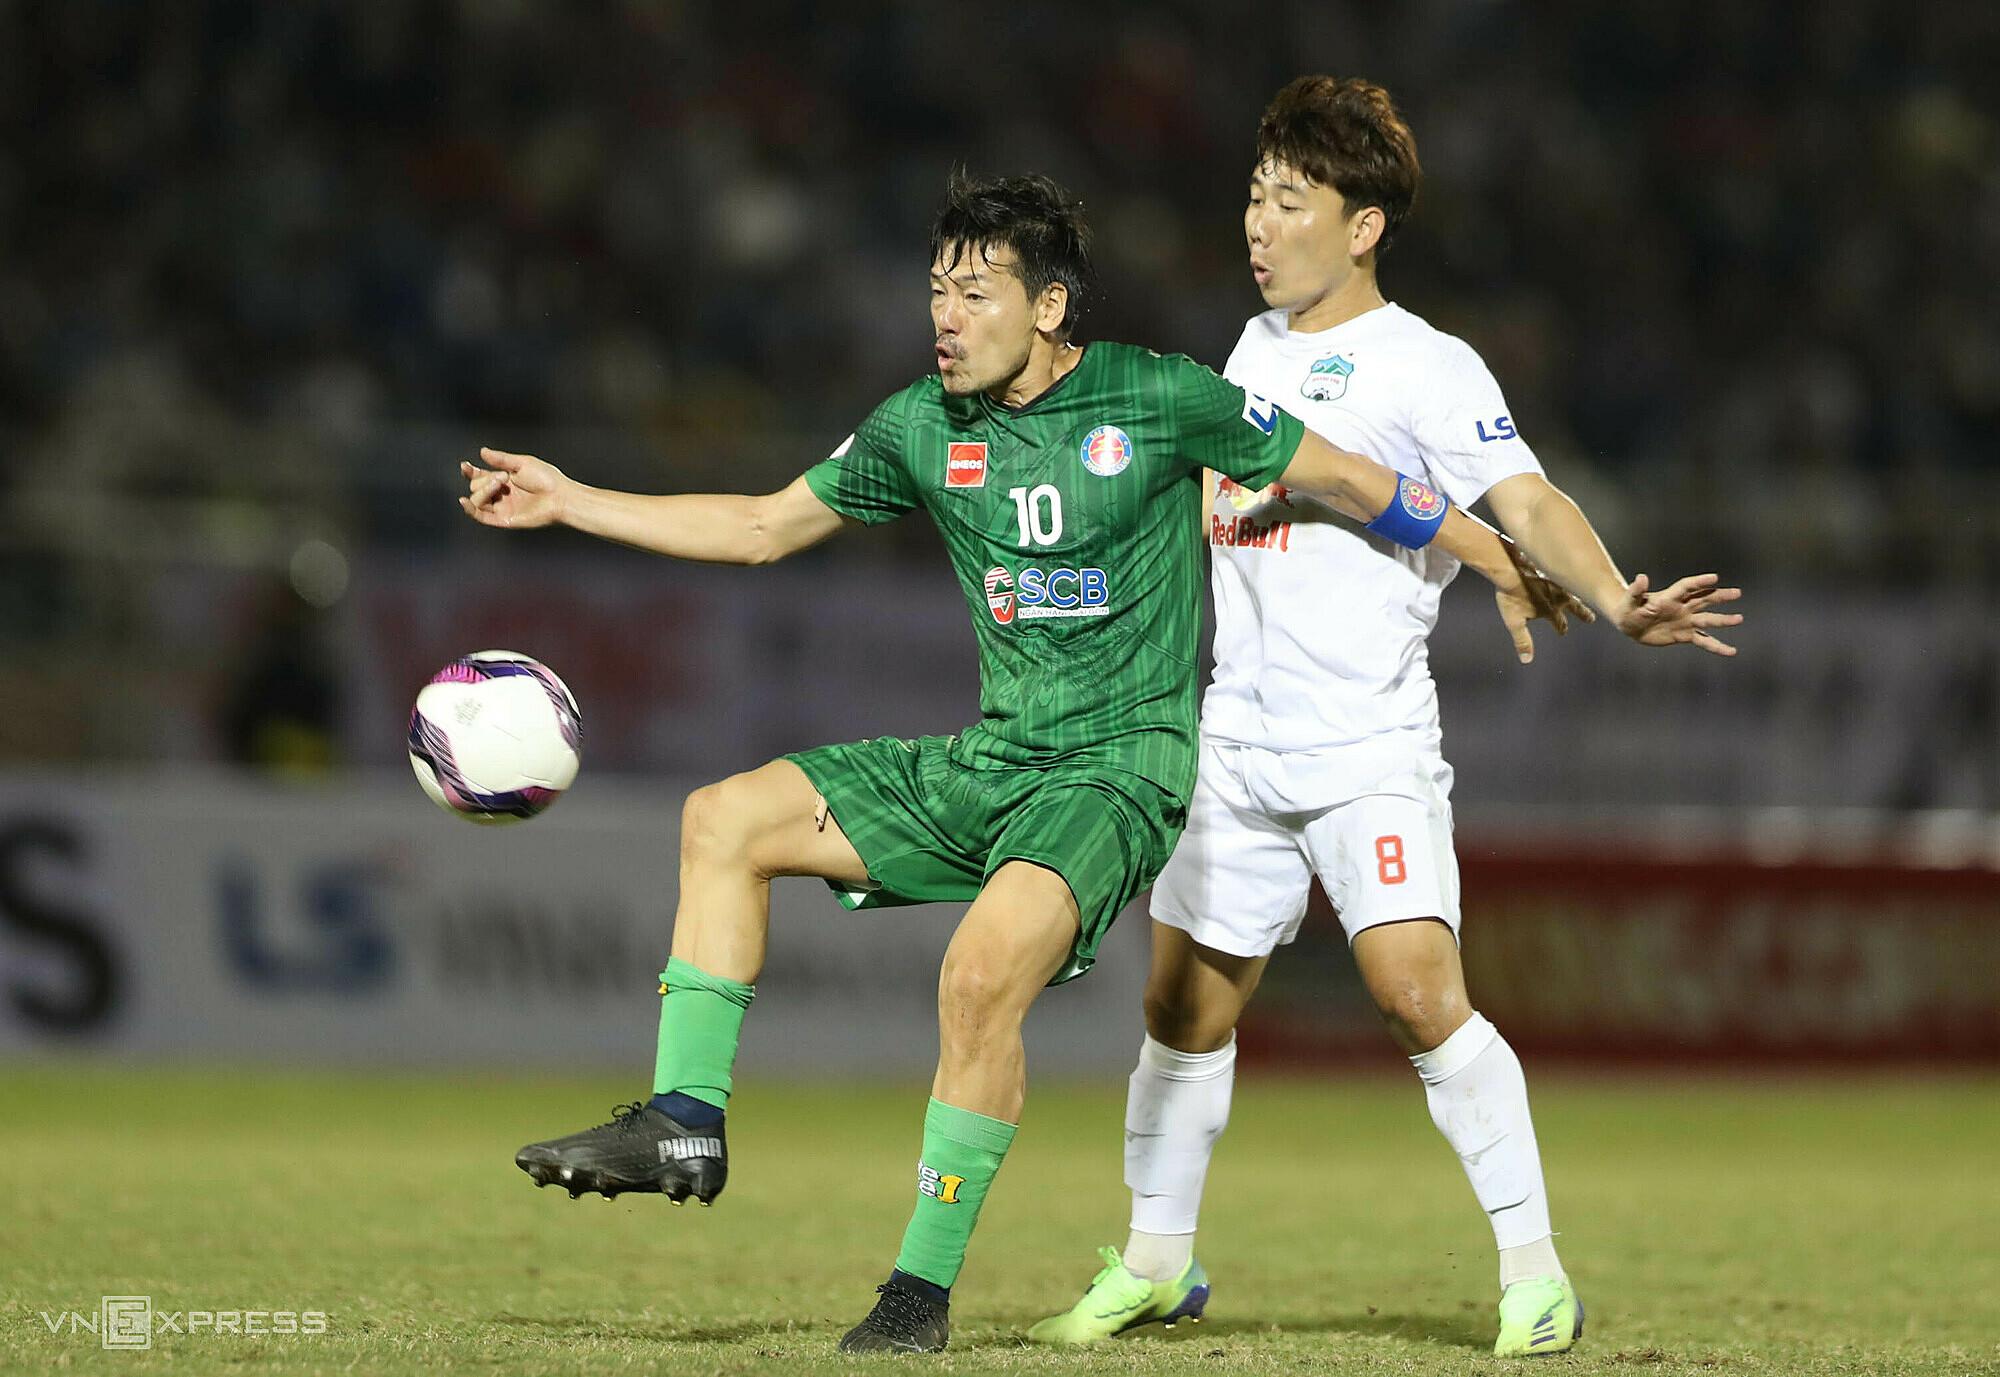 Daisuke Matsui (10) ต้องอำลา Saigon FC เพราะเล่นได้ไม่ดี  ภาพ: Duc Dong